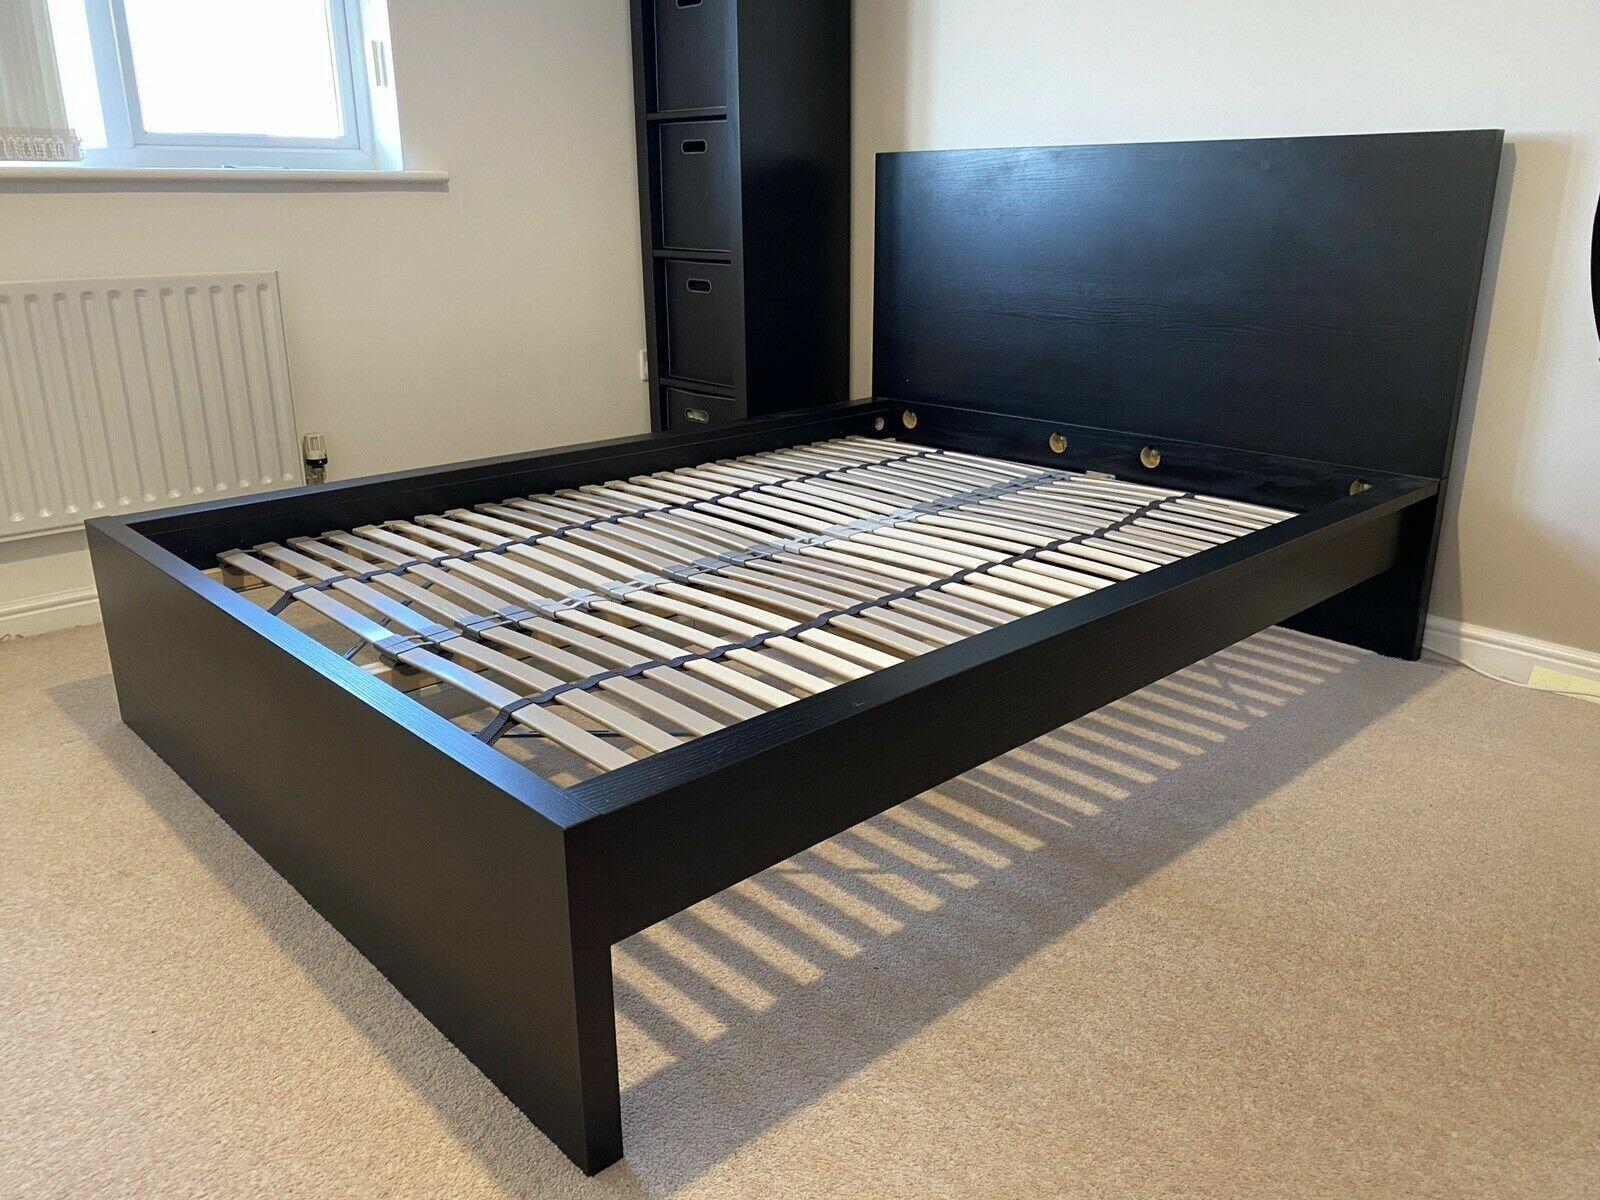 Ikea Malm King Bed Frame High Black Brown 599 311 61 For Sale Ebay